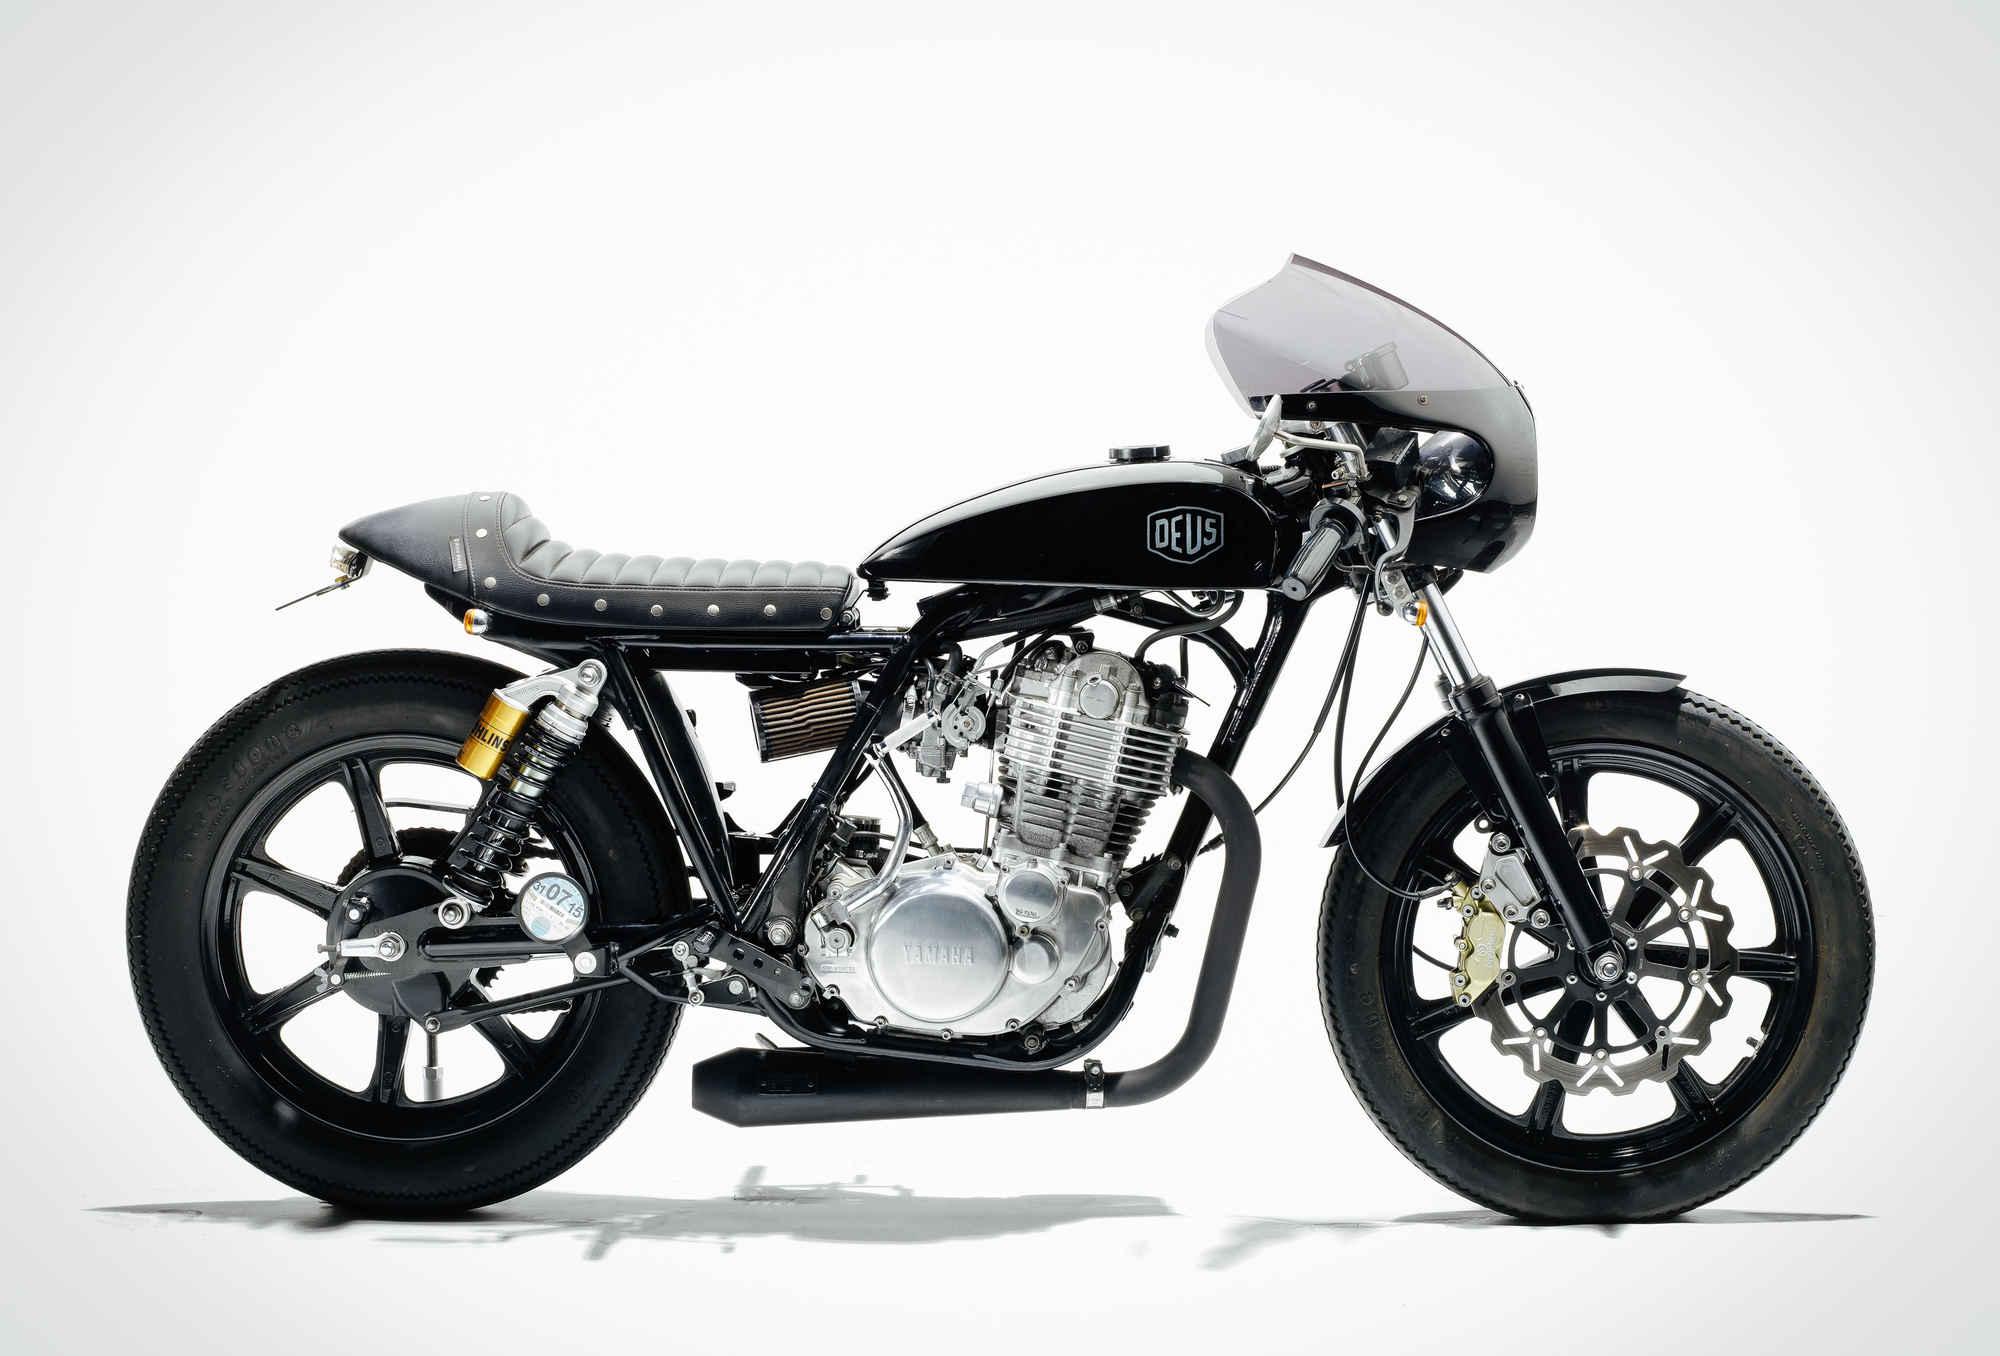 2010 Yamaha SR400 'Grievous Angel' by Deus Ex Machina